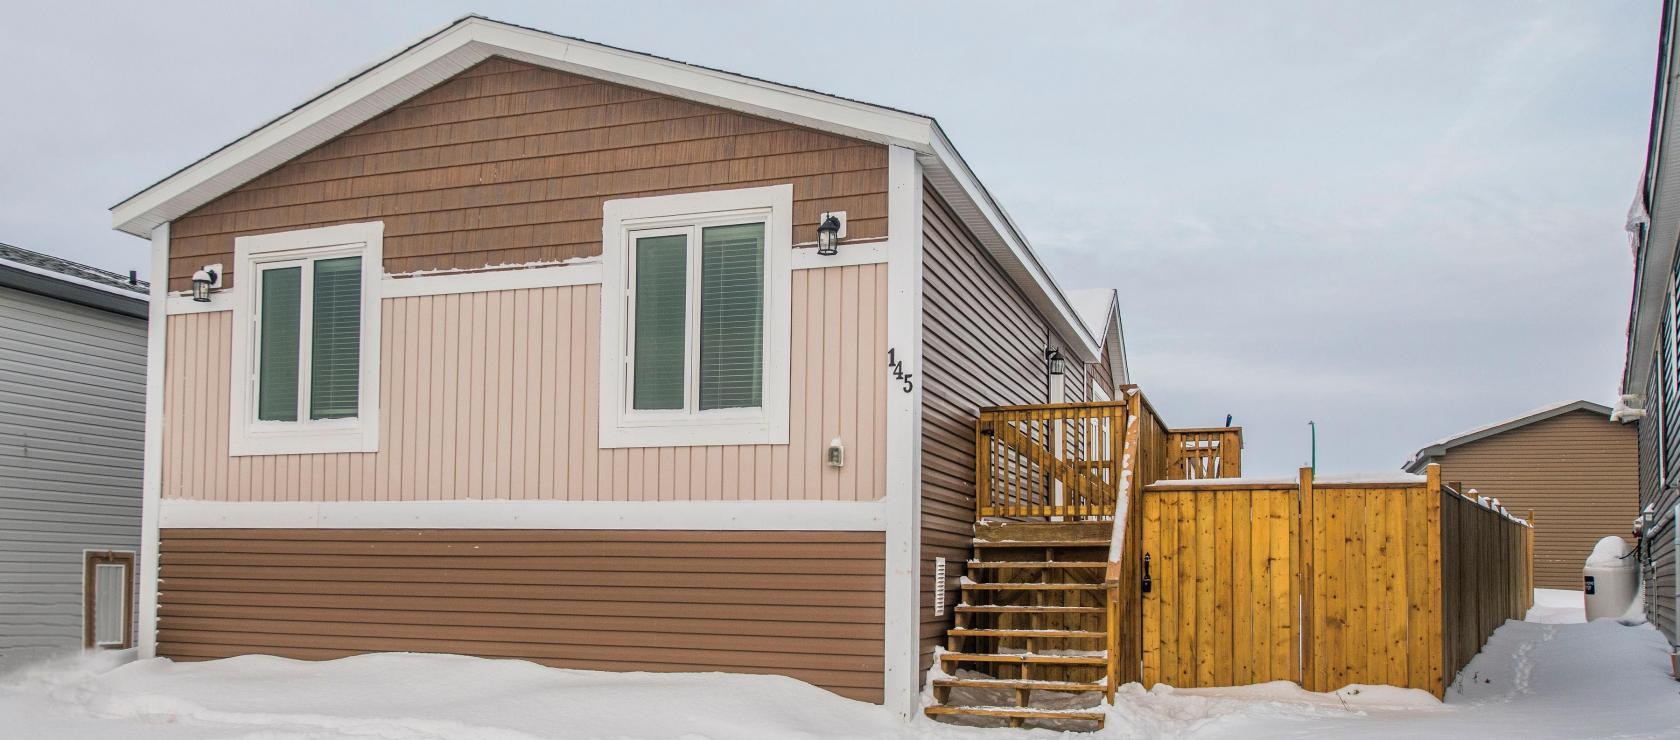 145 Hall Crescent, Kam Lake, Yellowknife 2